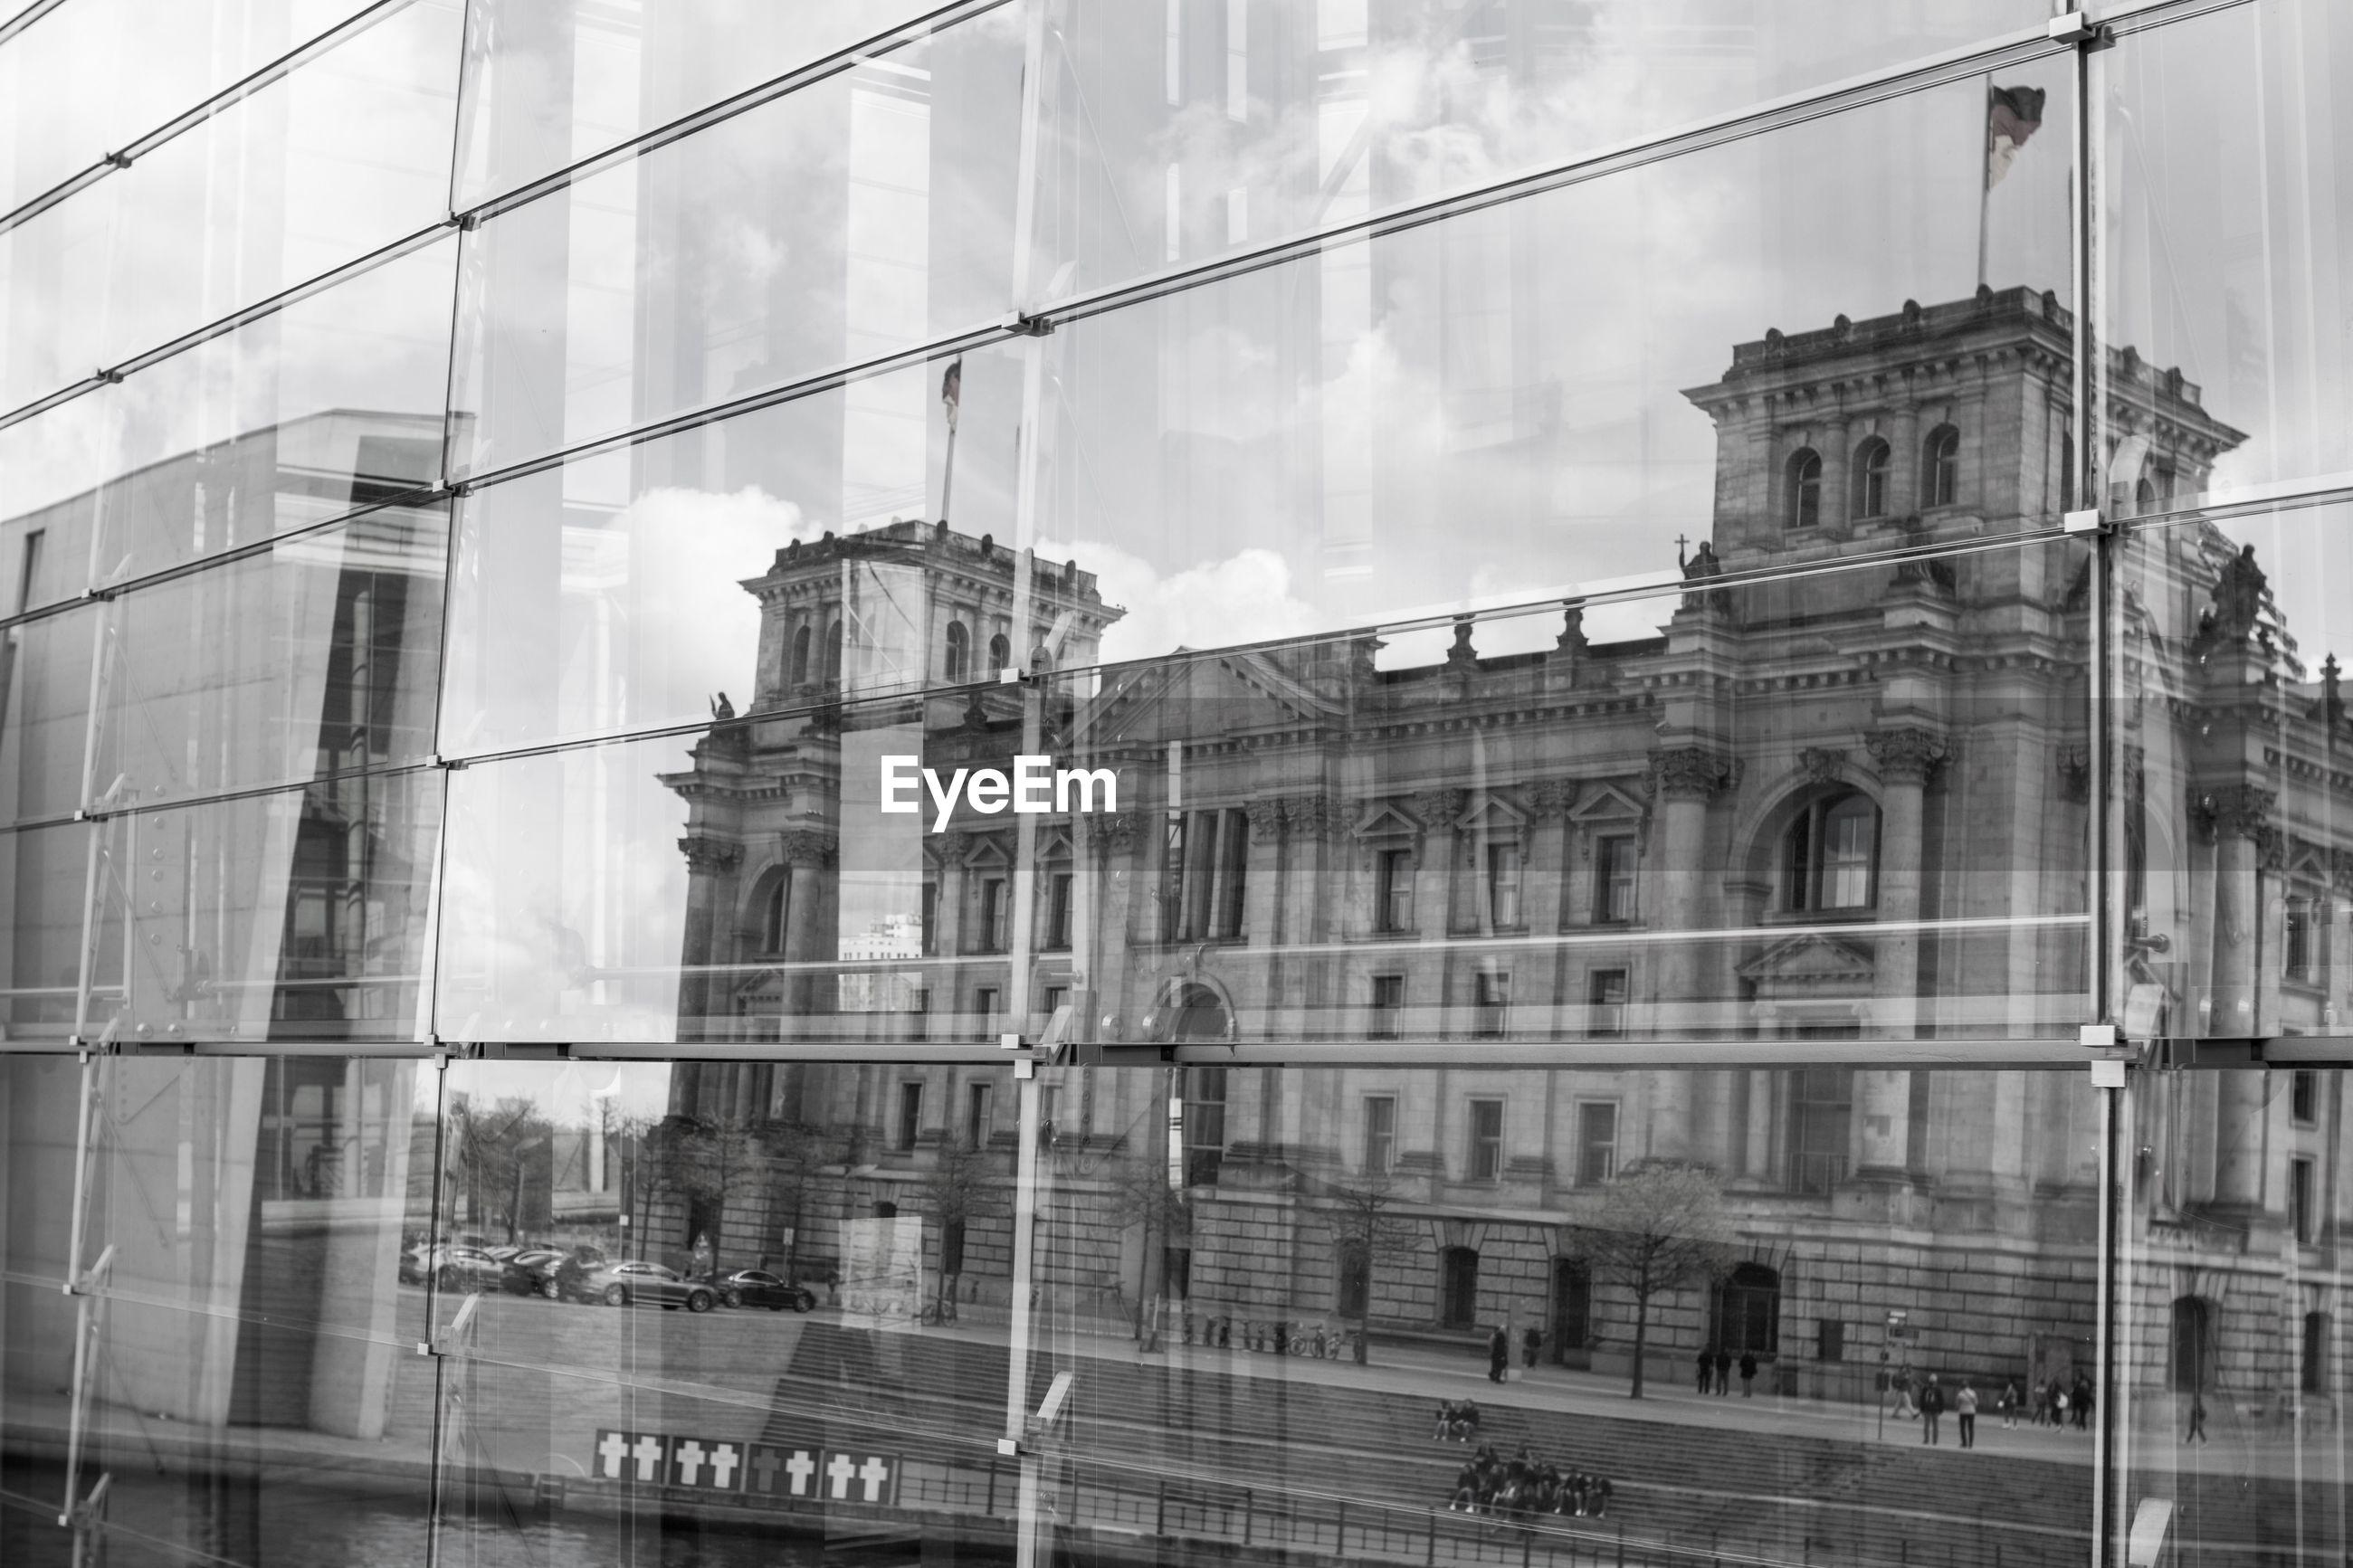 Building reflecting on glass window